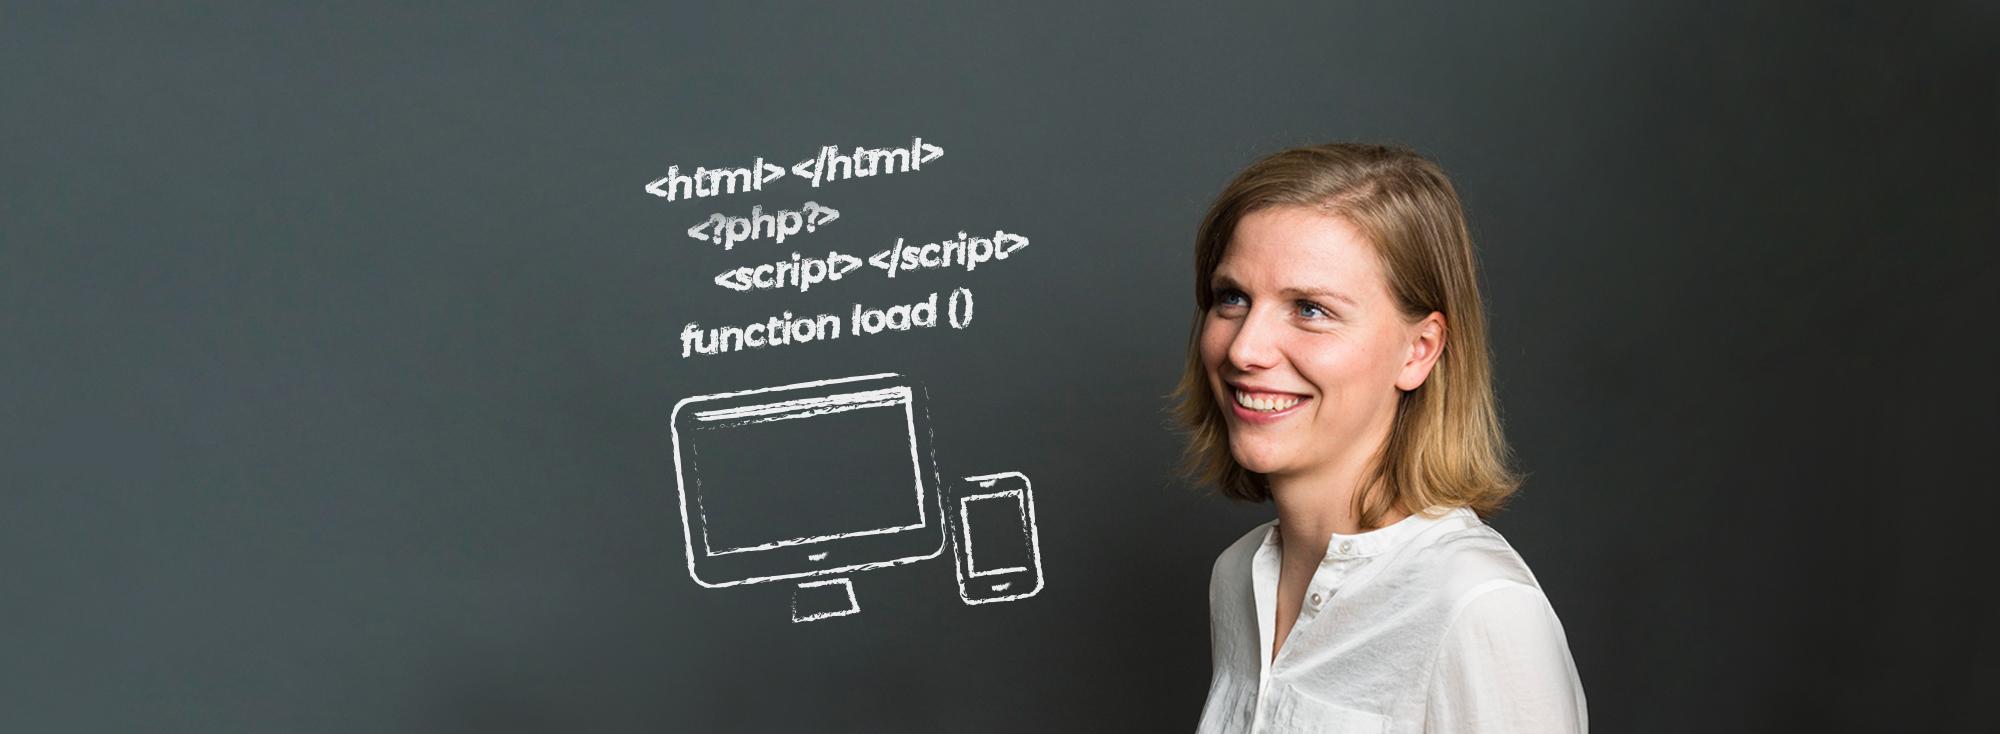 Web-Entwicklern